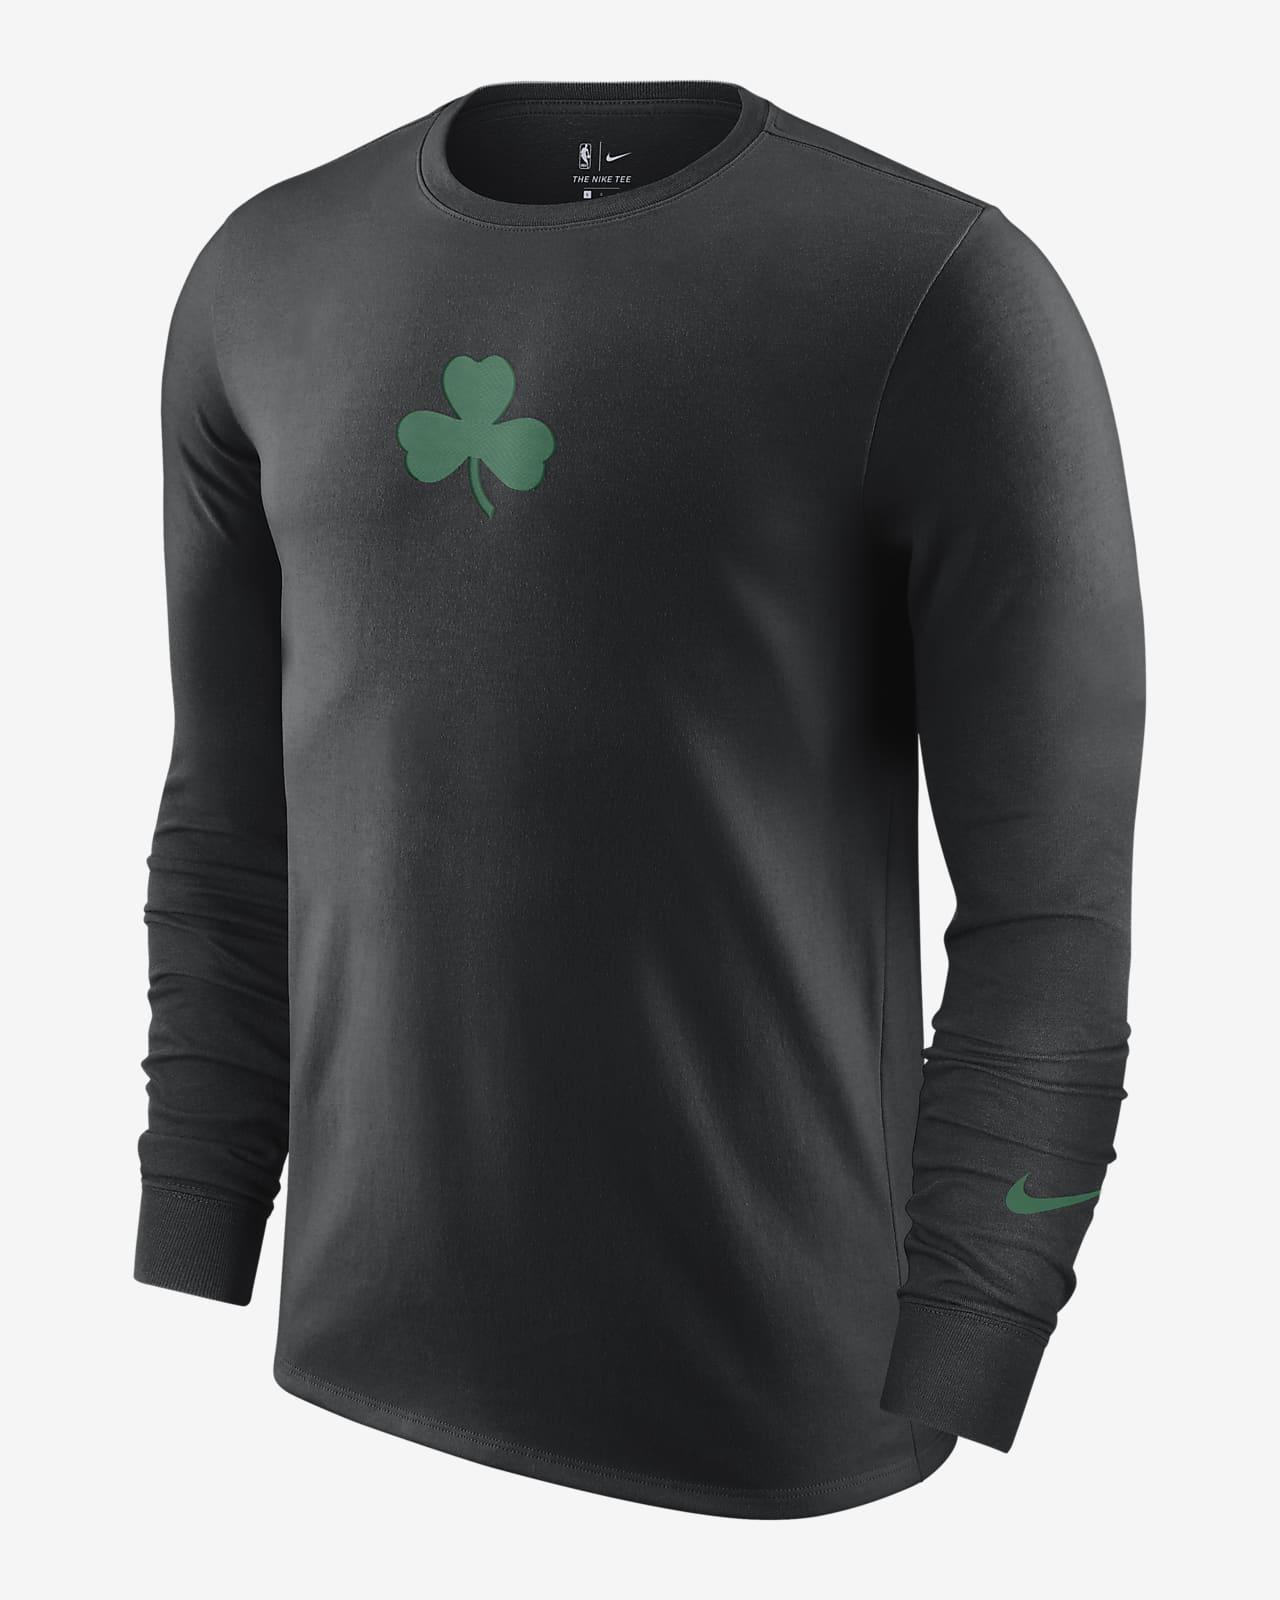 Boston Celtics Courtside City Edition Men's Nike NBA T-Shirt